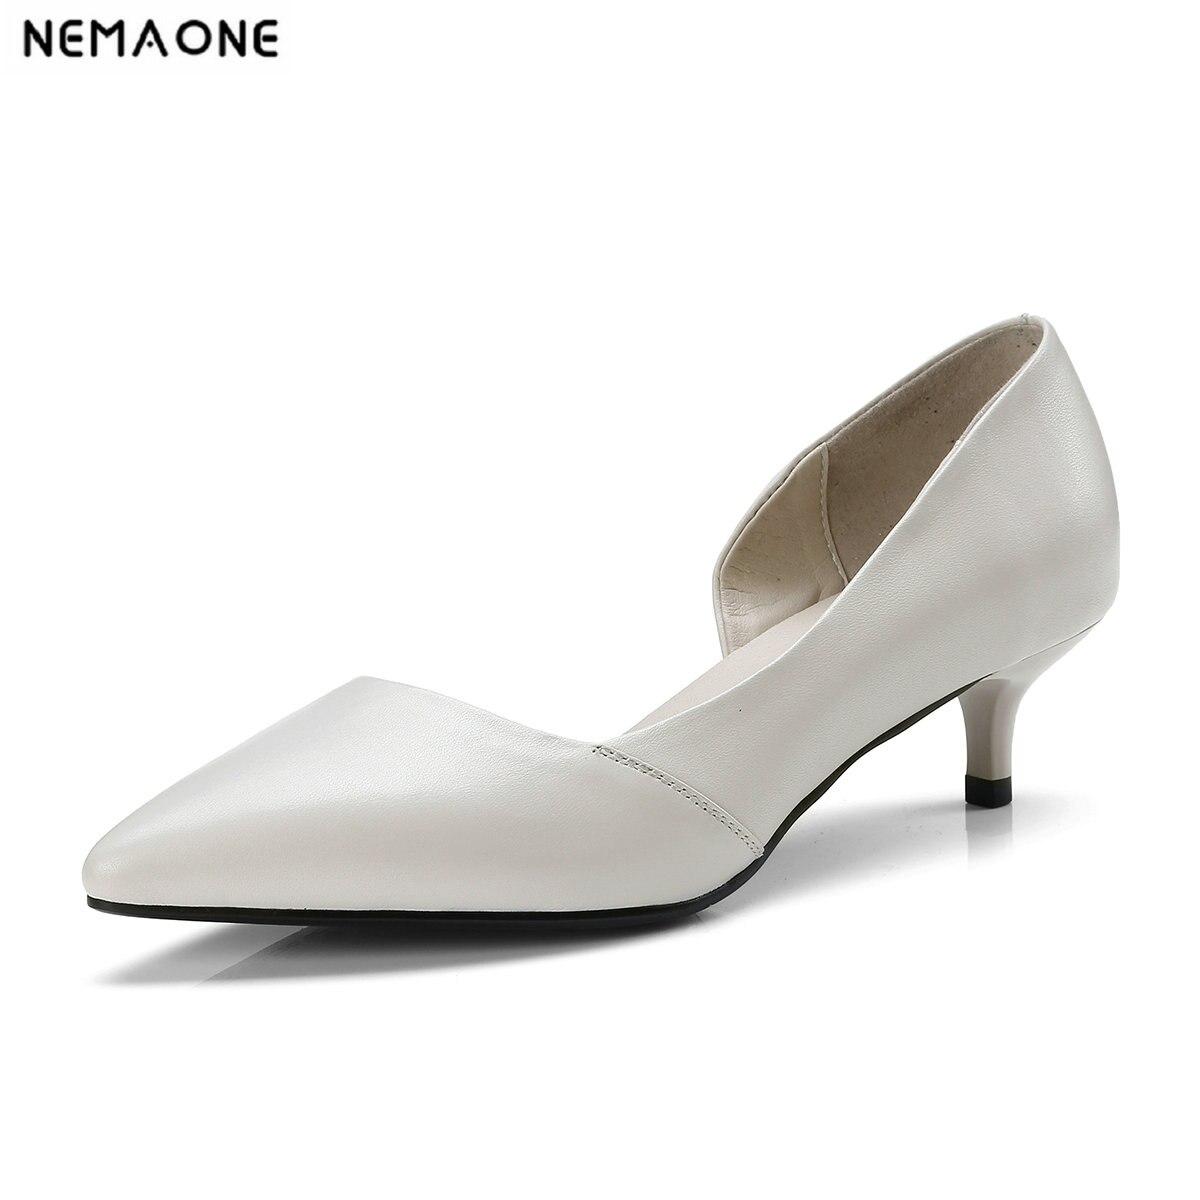 NEMAONE Genuine Leather Women 4cm Stiletto High Heel Shoes Pointed Toe Retro Ladies Slip on Pumps